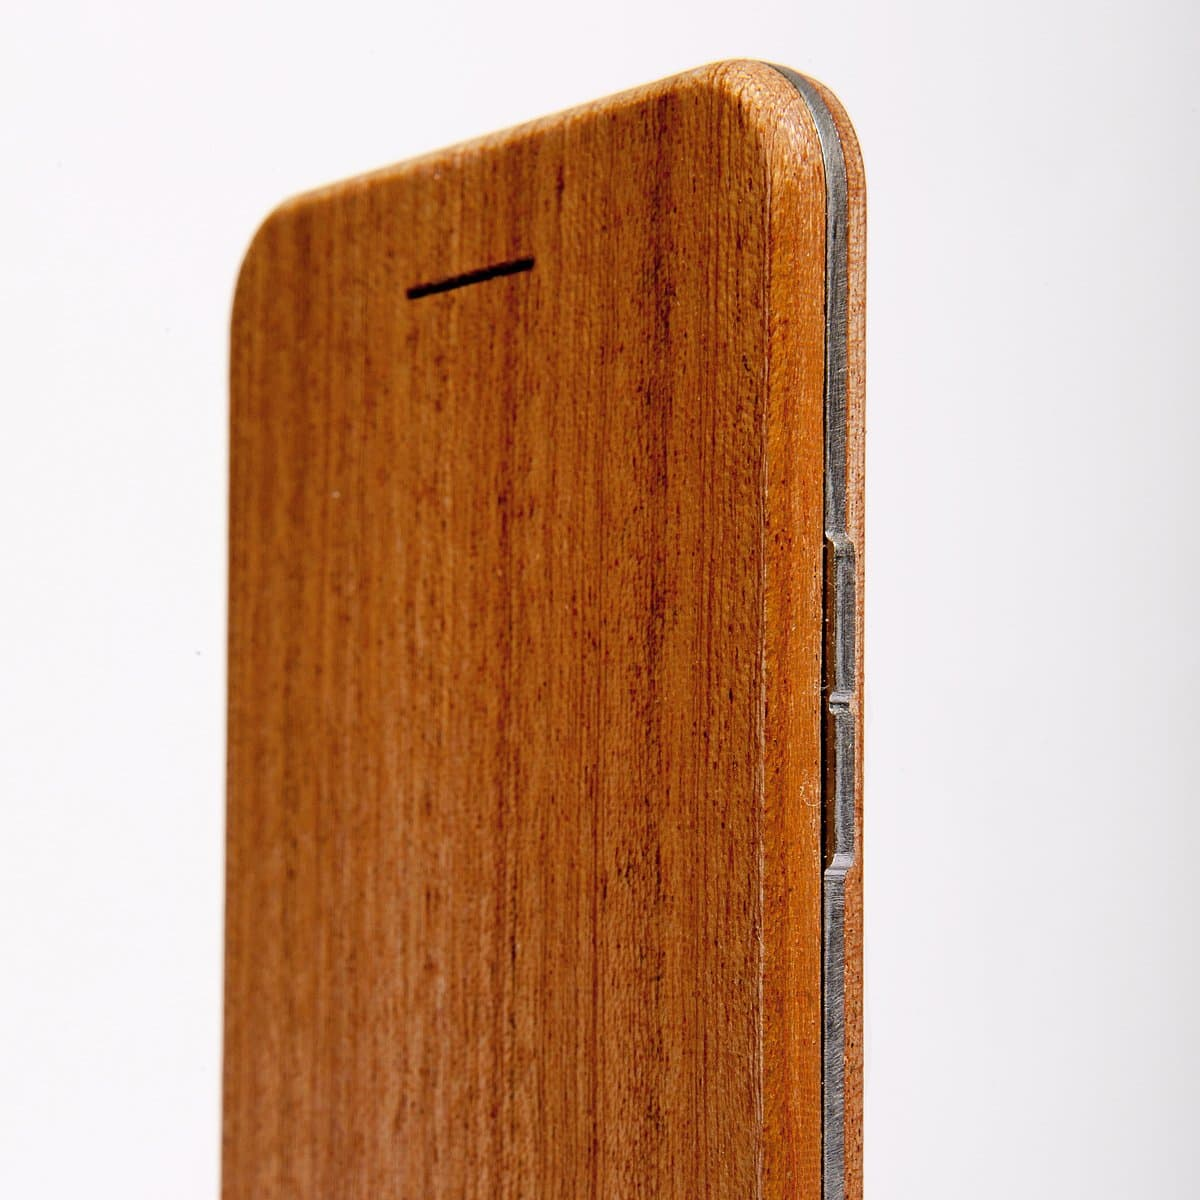 Complicated Needs - Digital Detox Phone Design